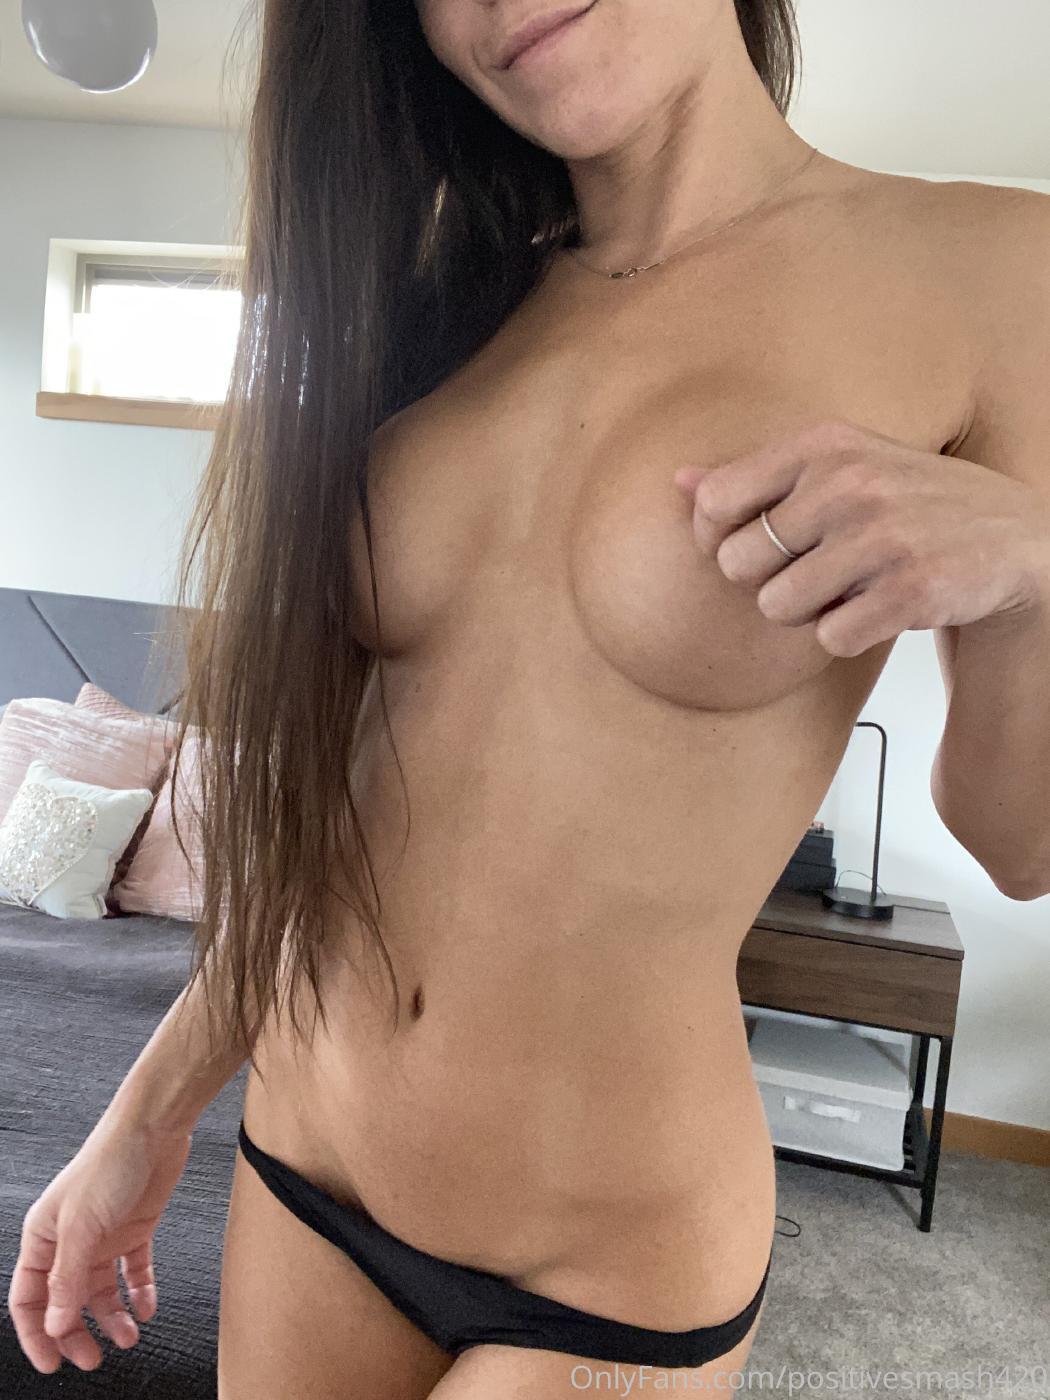 Positive Smash Nude Bikini Strip Onlyfans Set Leaked 0002